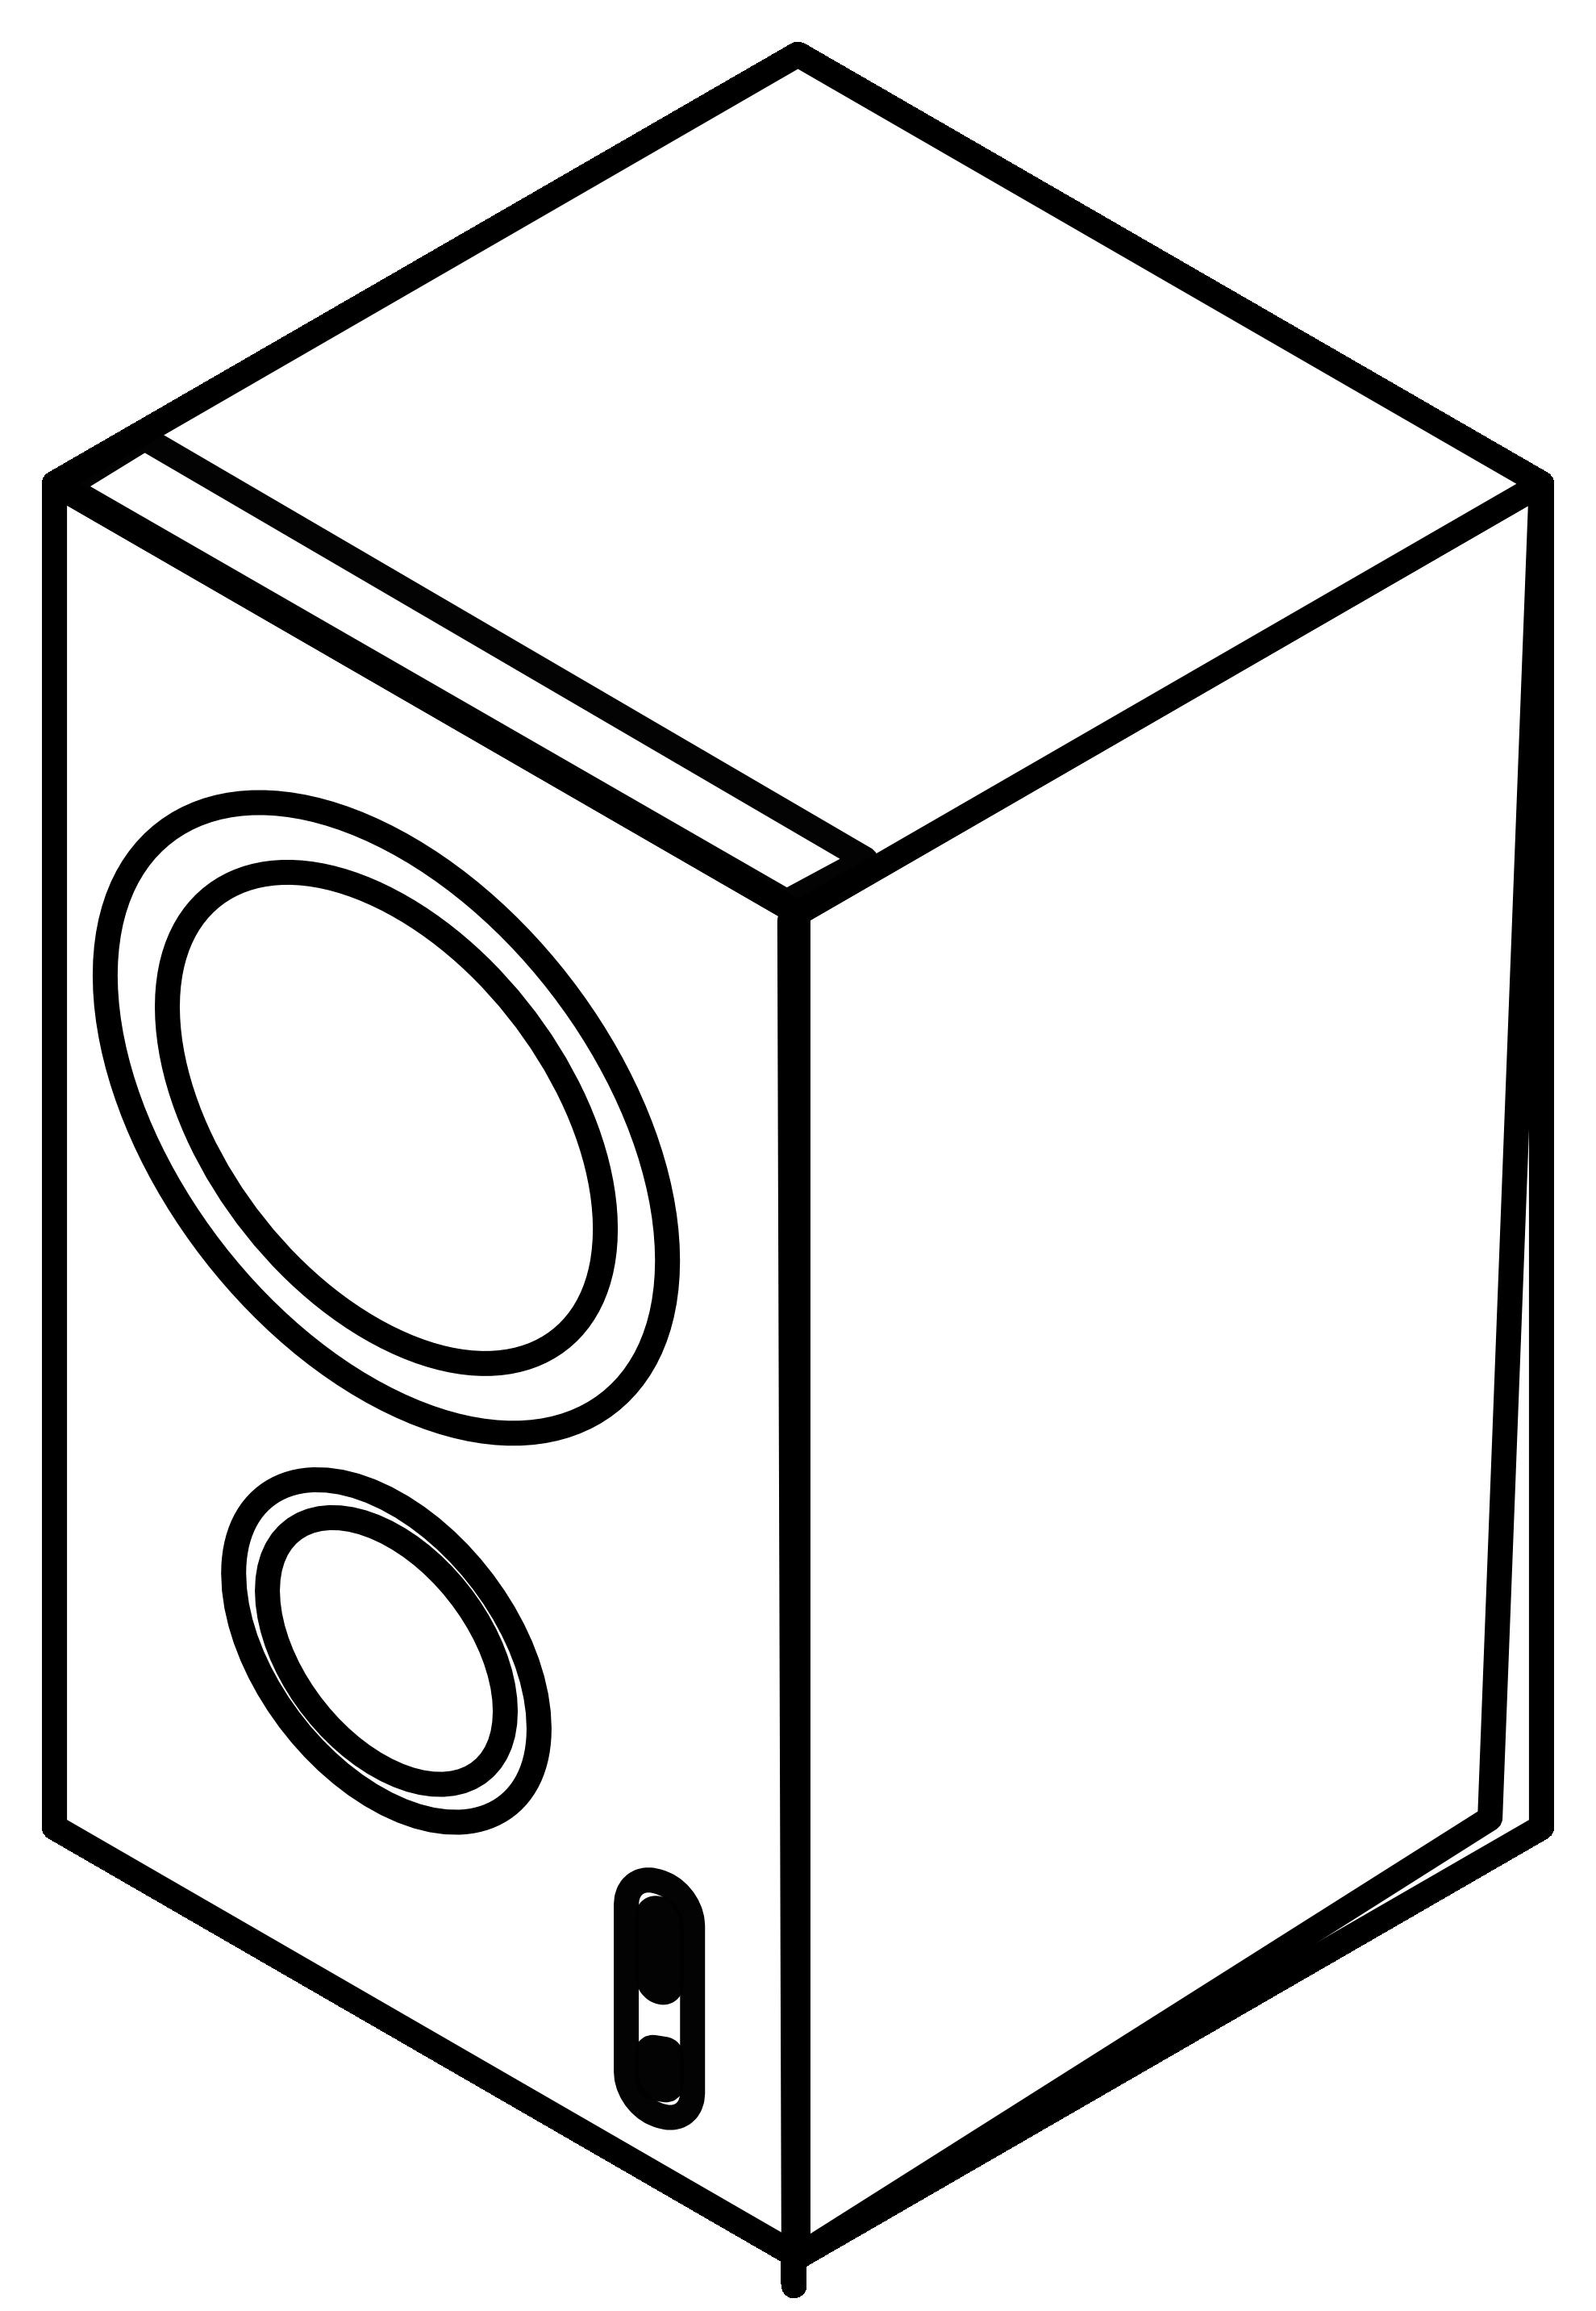 Loudspeaker 20clipart | Clipart Panda - Free Clipart Images